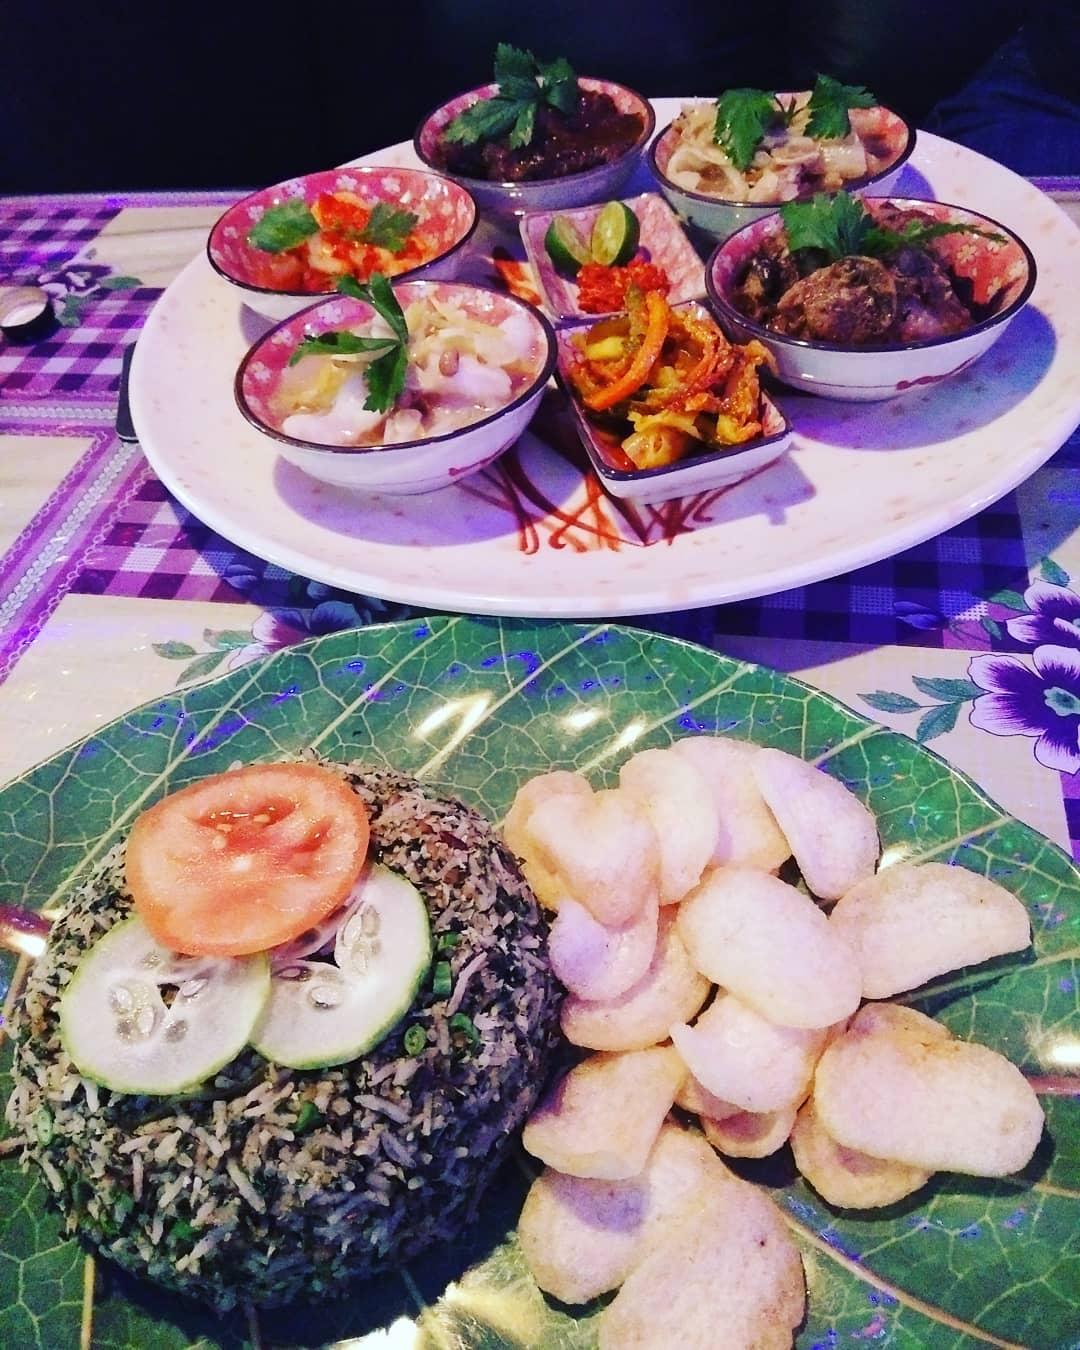 Neighbourhood Cafes Restaurants Singapore Woody Family Cafe Food